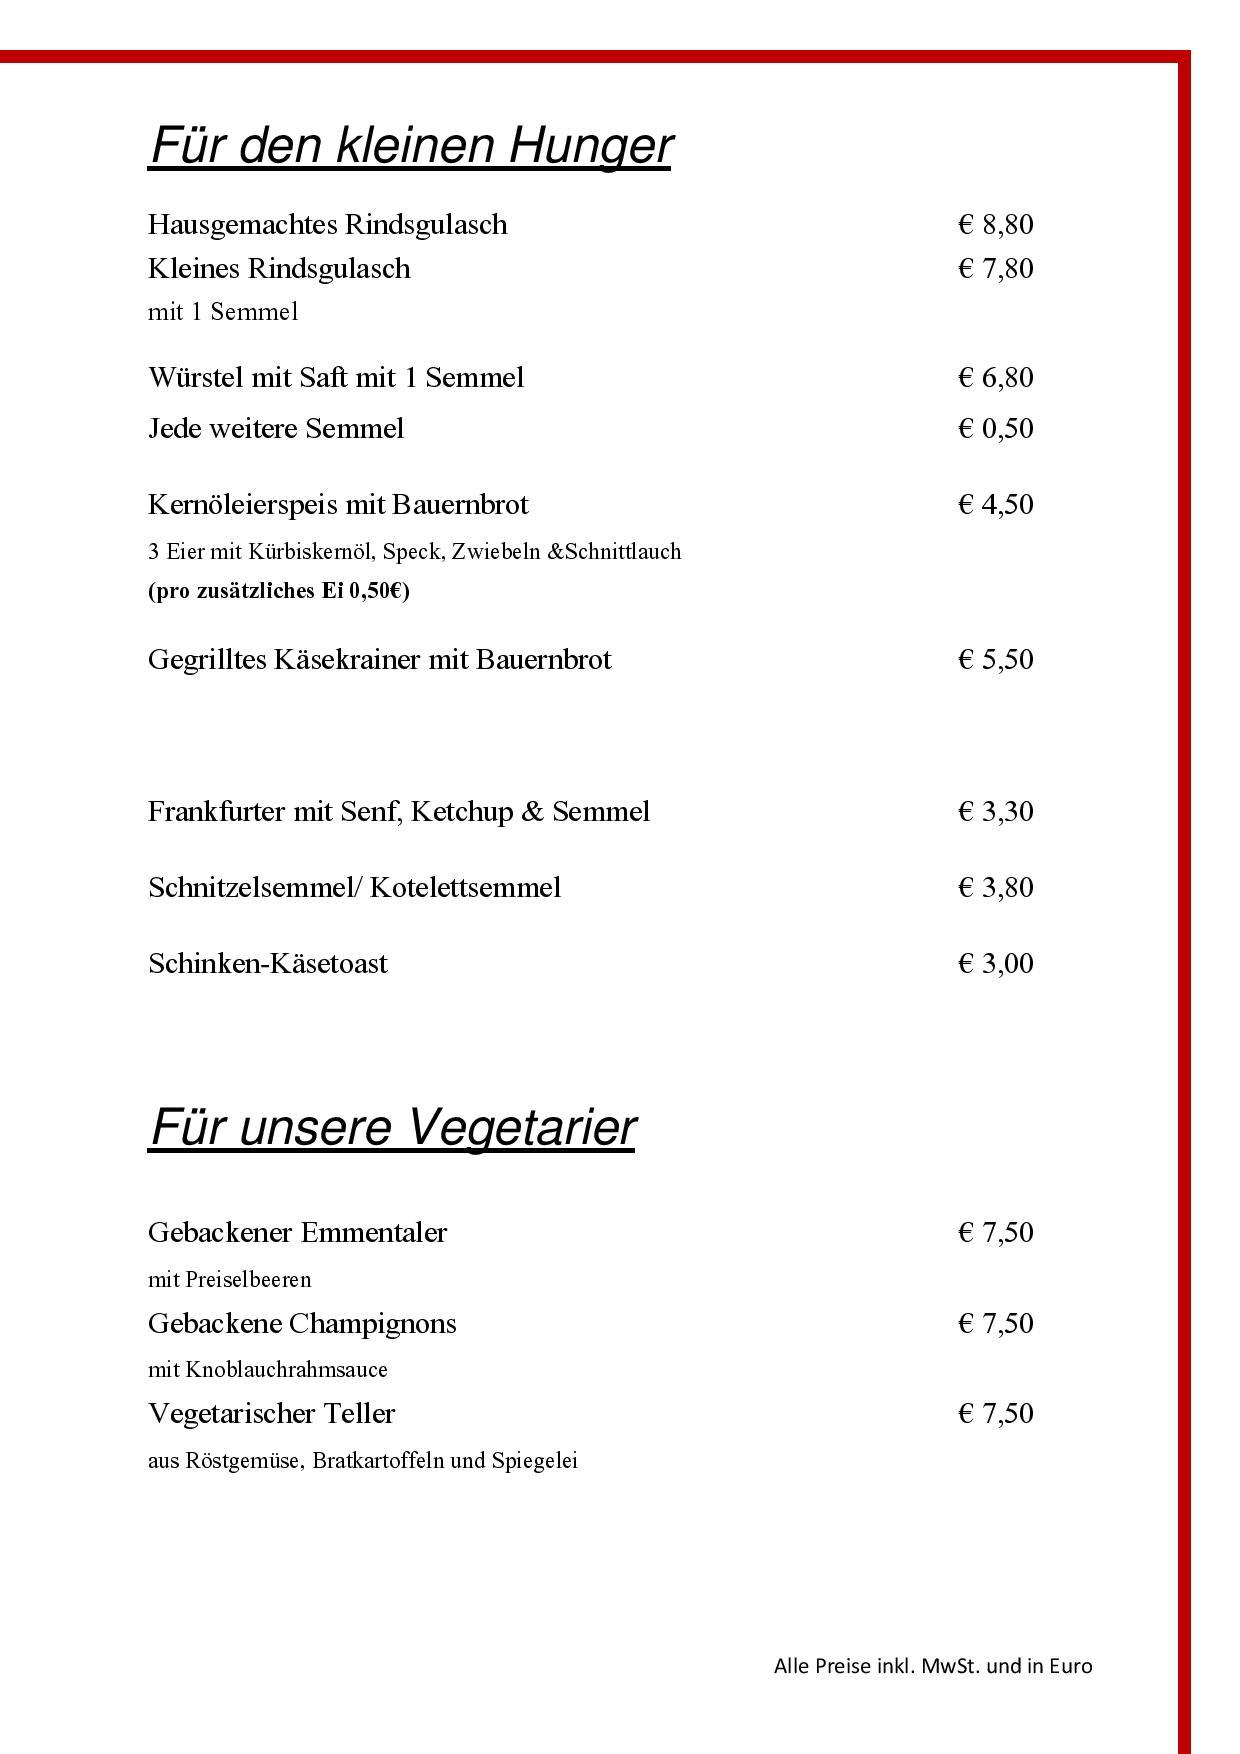 Speisekarte-3-page-001